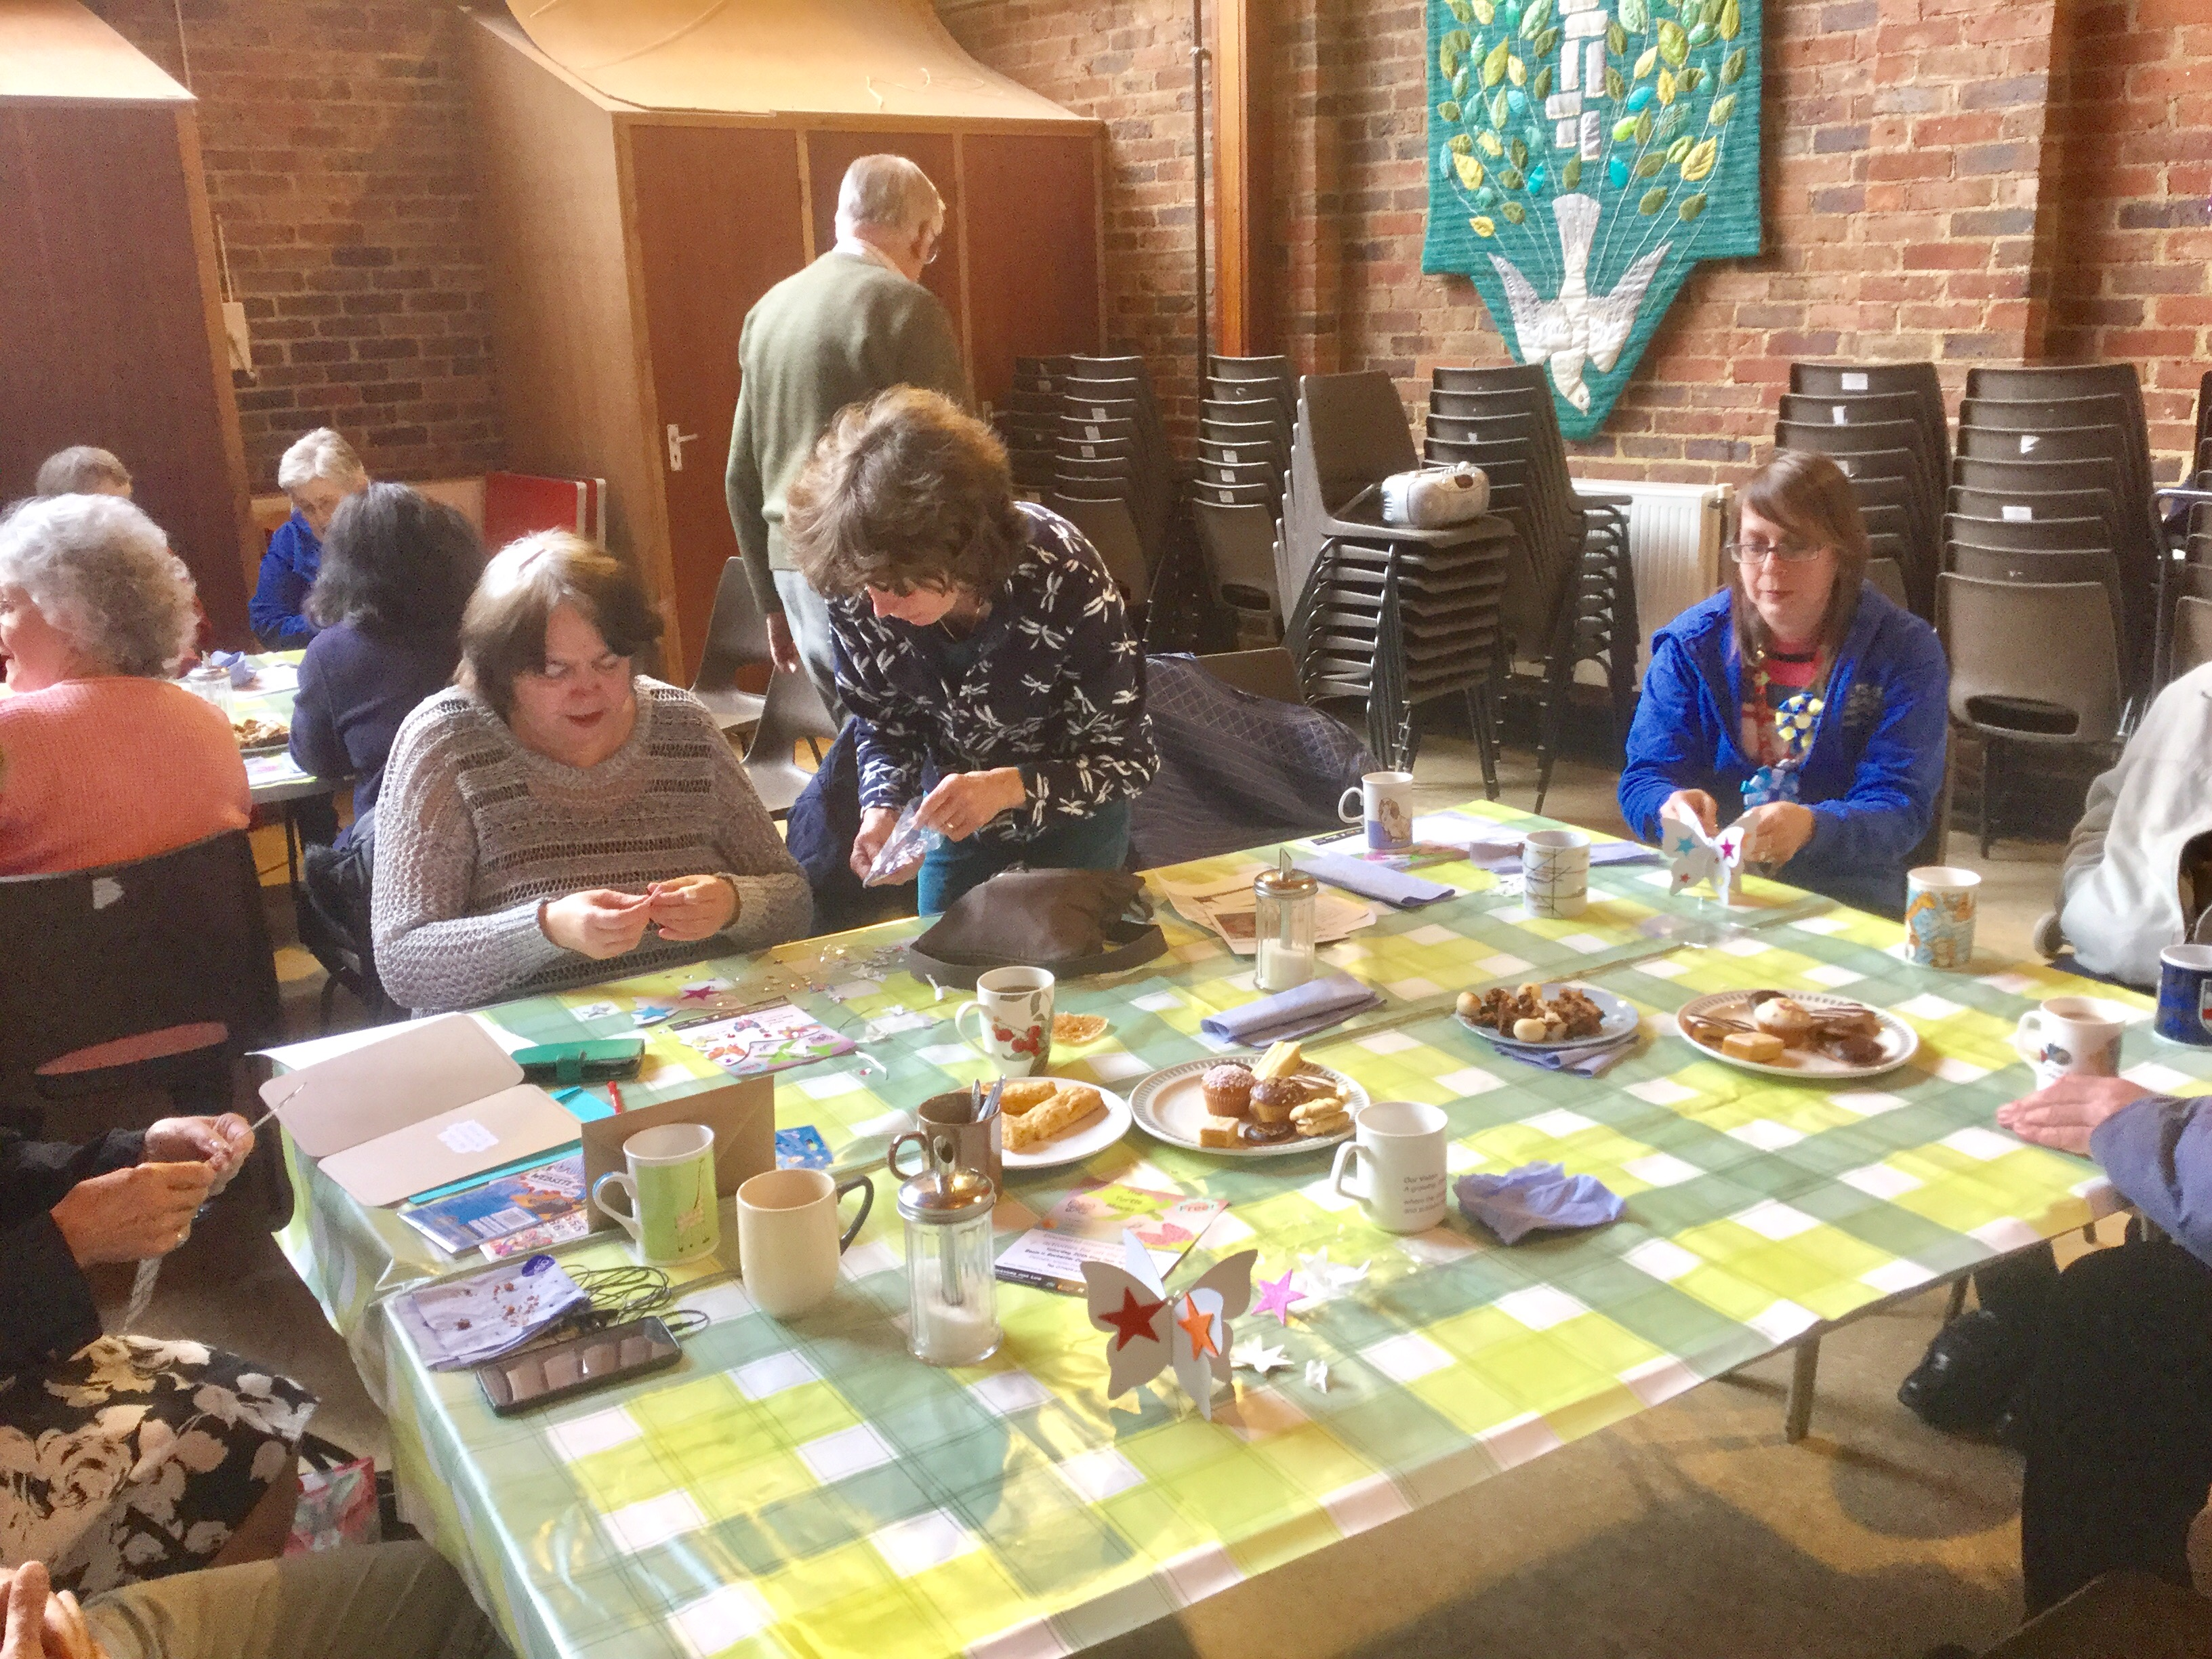 Rochester dementia cafe 1 rochester literature festival - Rochester home and garden show 2017 ...